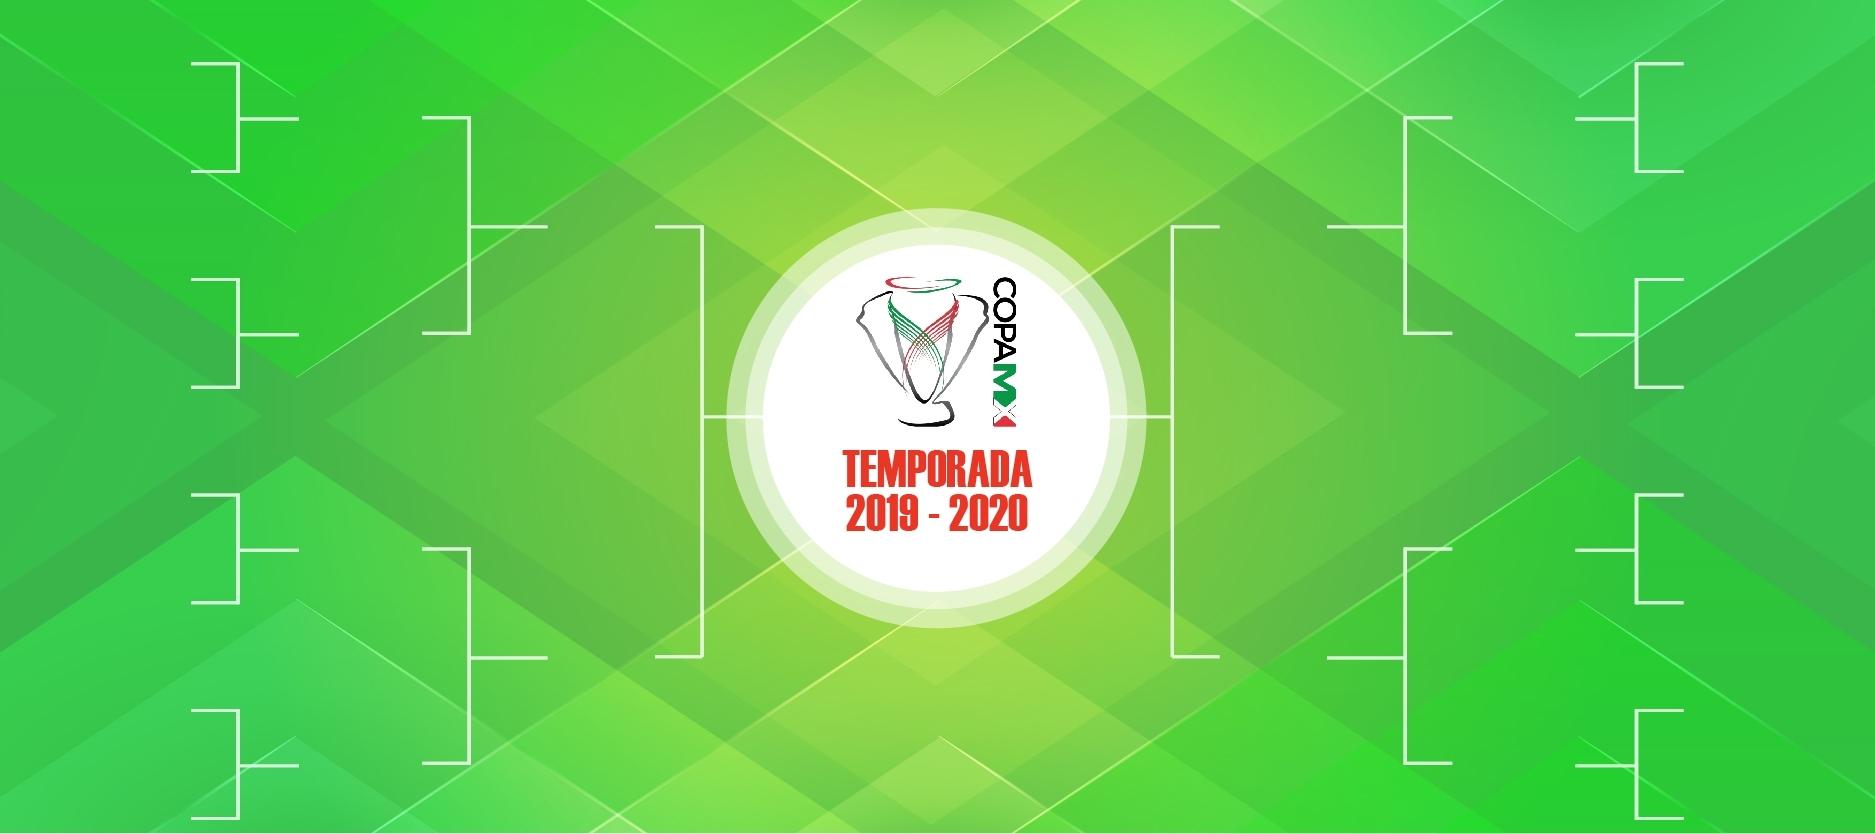 Calendario Copa Mx Temporada 2019 -2020 - Pronósticos Deportivos for Calendario Liga Mx 2019 2020